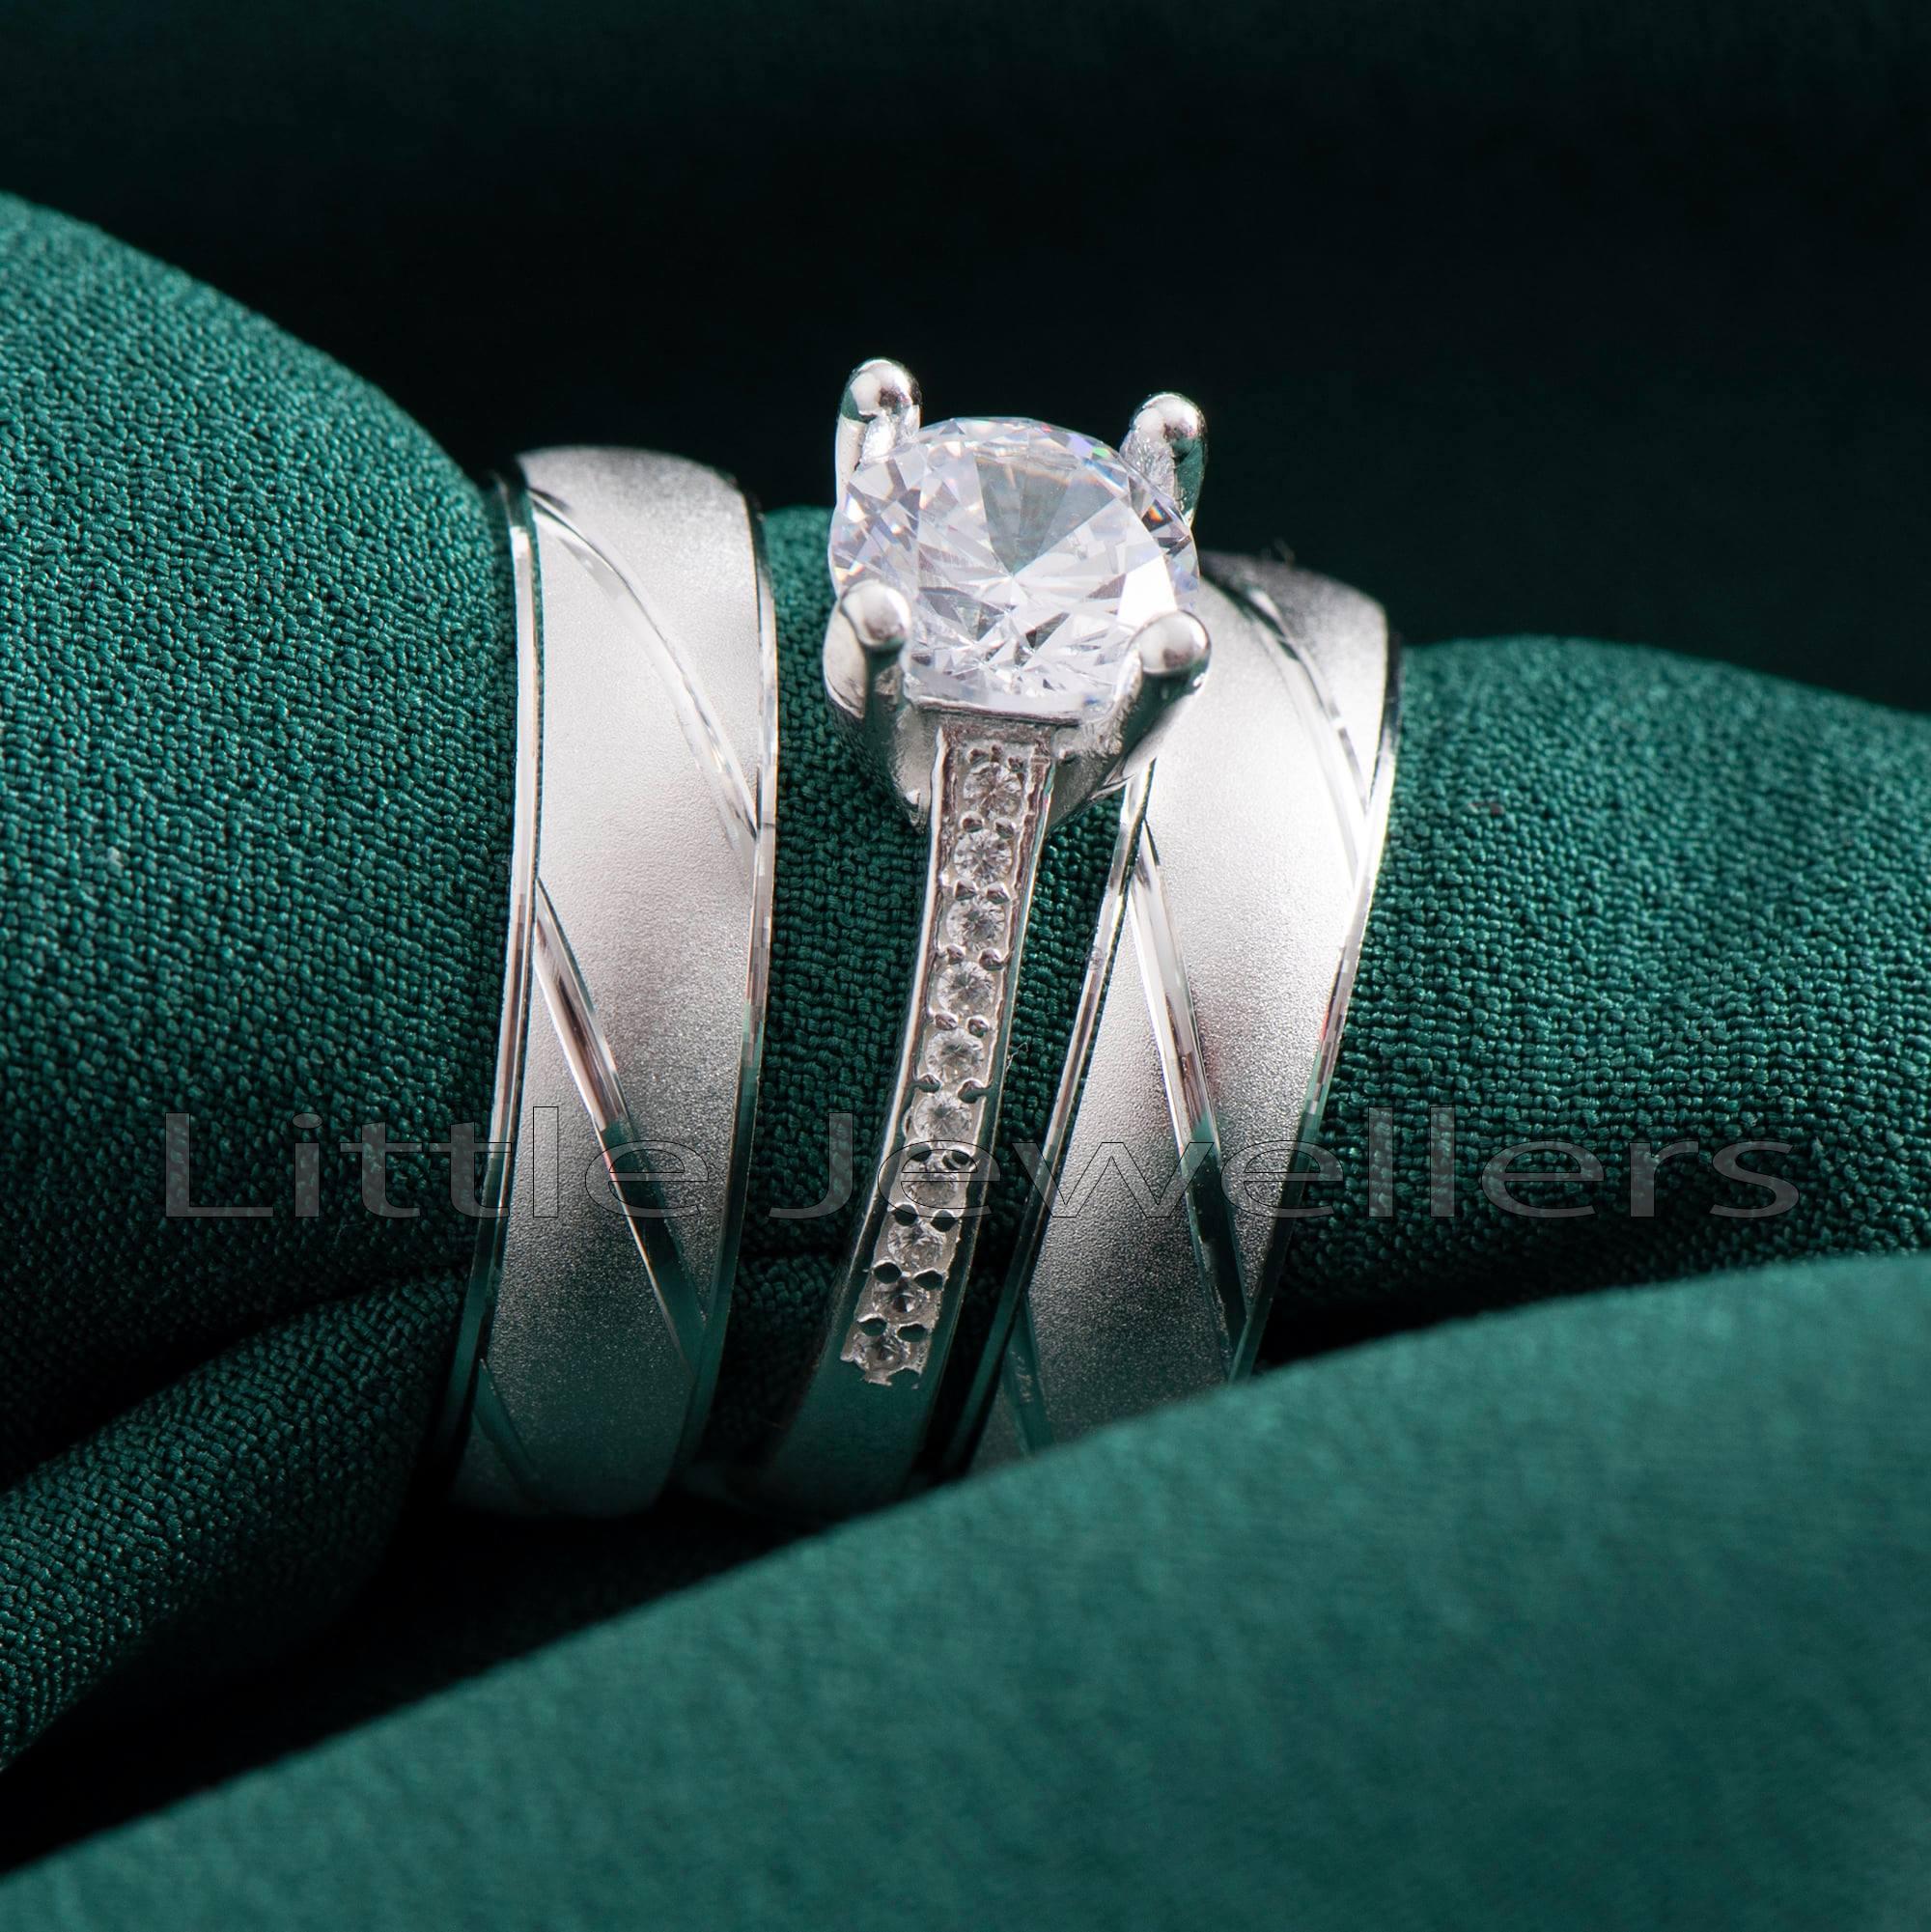 A stunning sterling silver matching wedding band set